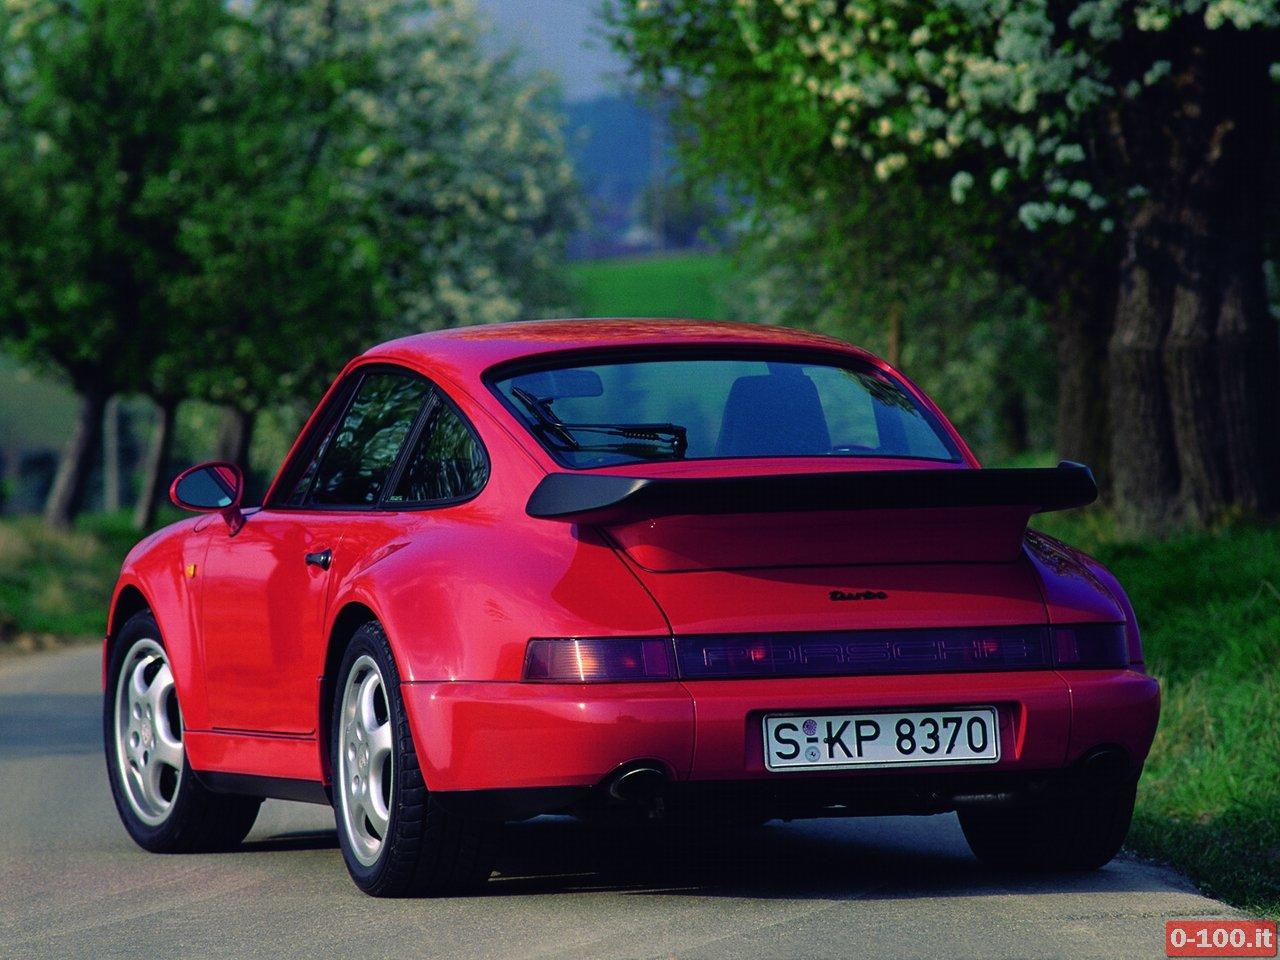 porsche_911-930-964-993-996-997_turbo_0-100_9